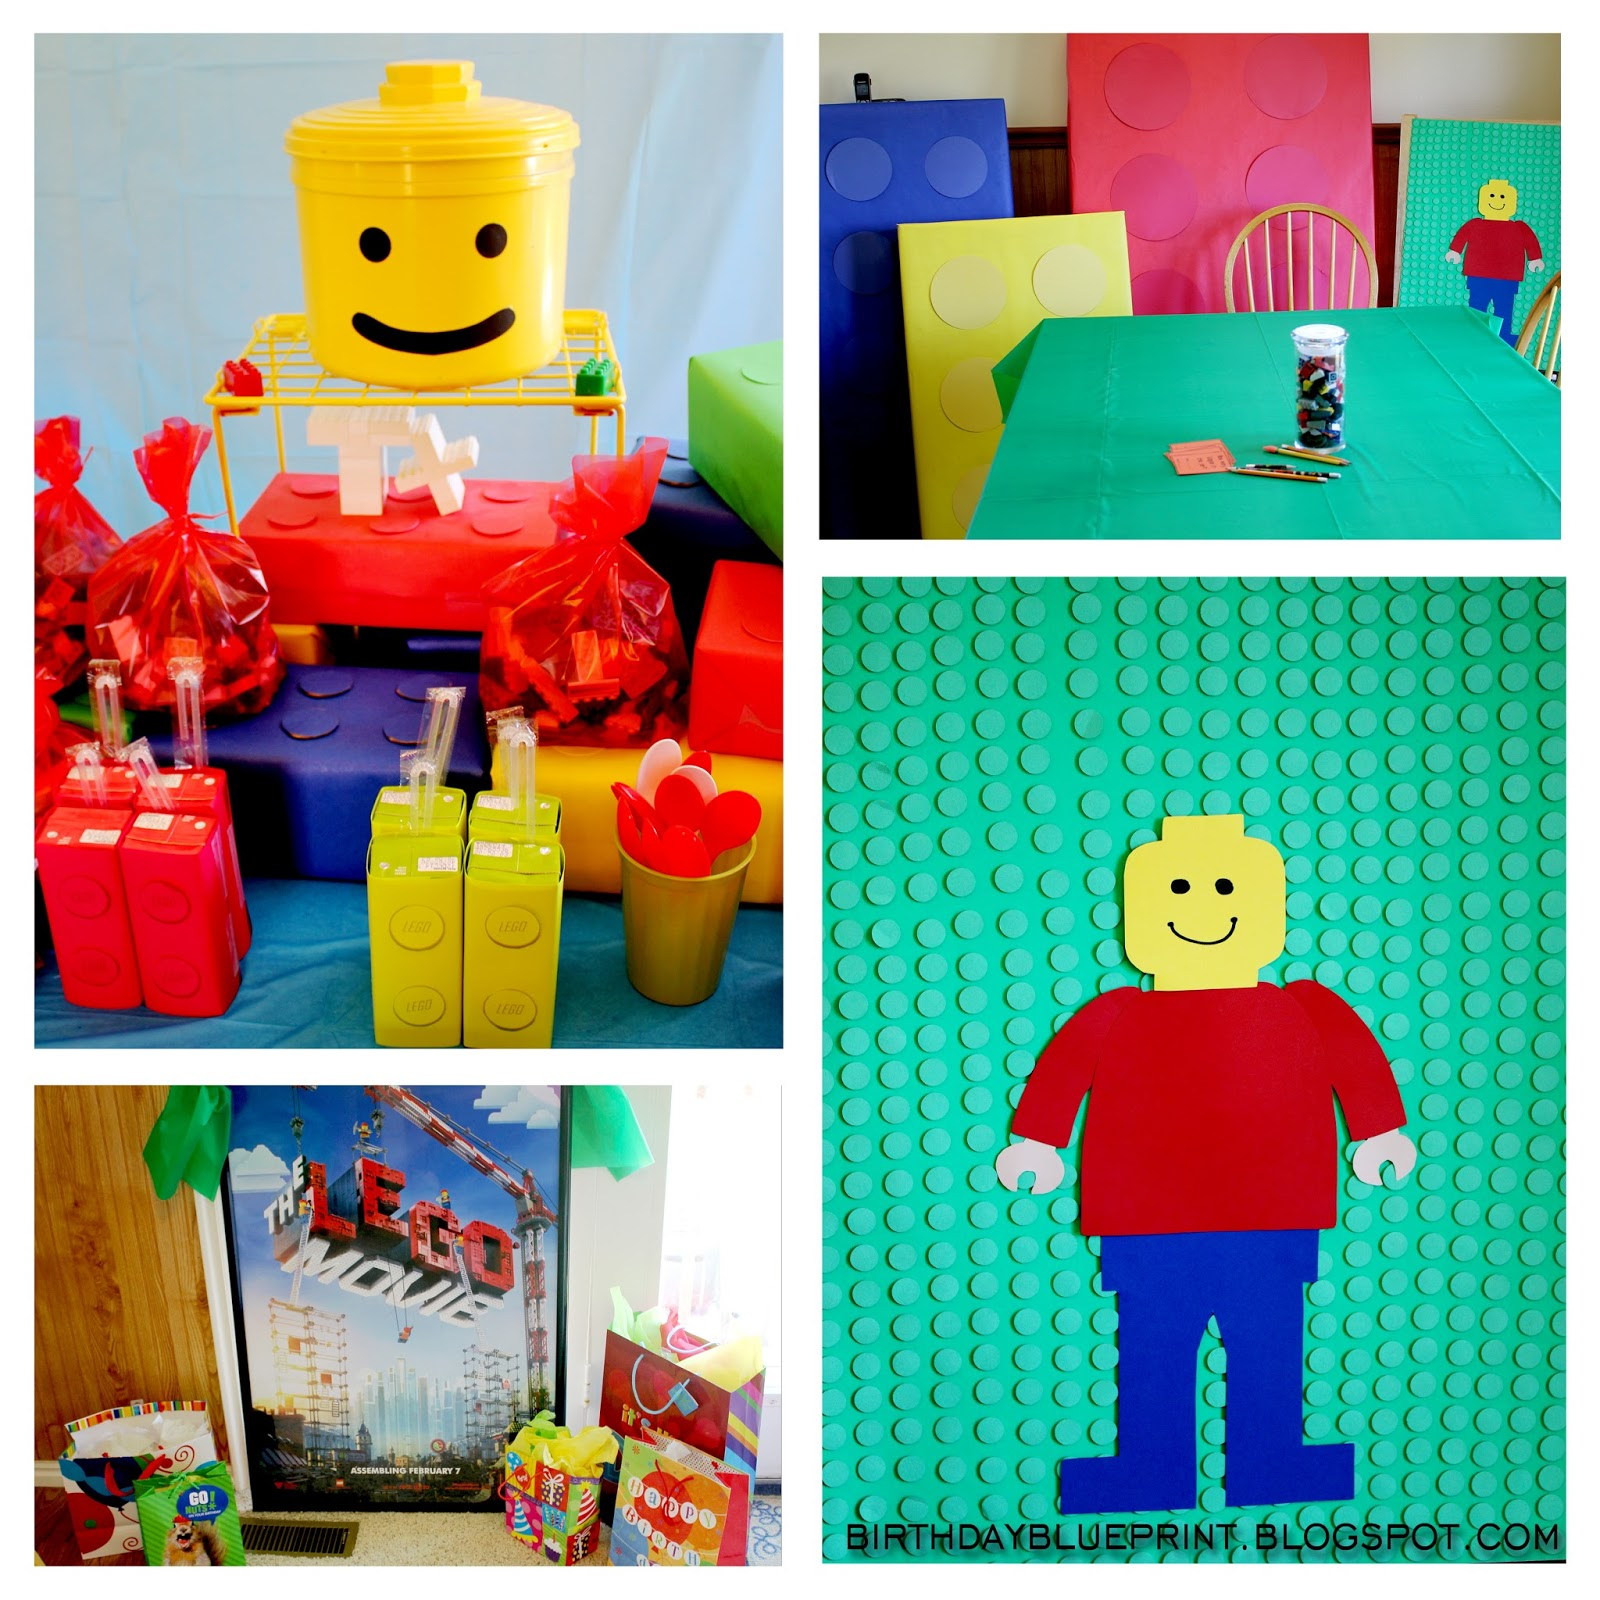 Lego Accessories For Bedroom Lego Bedroom Bedroom Commission Lego Fan Graffiti Art Workshop